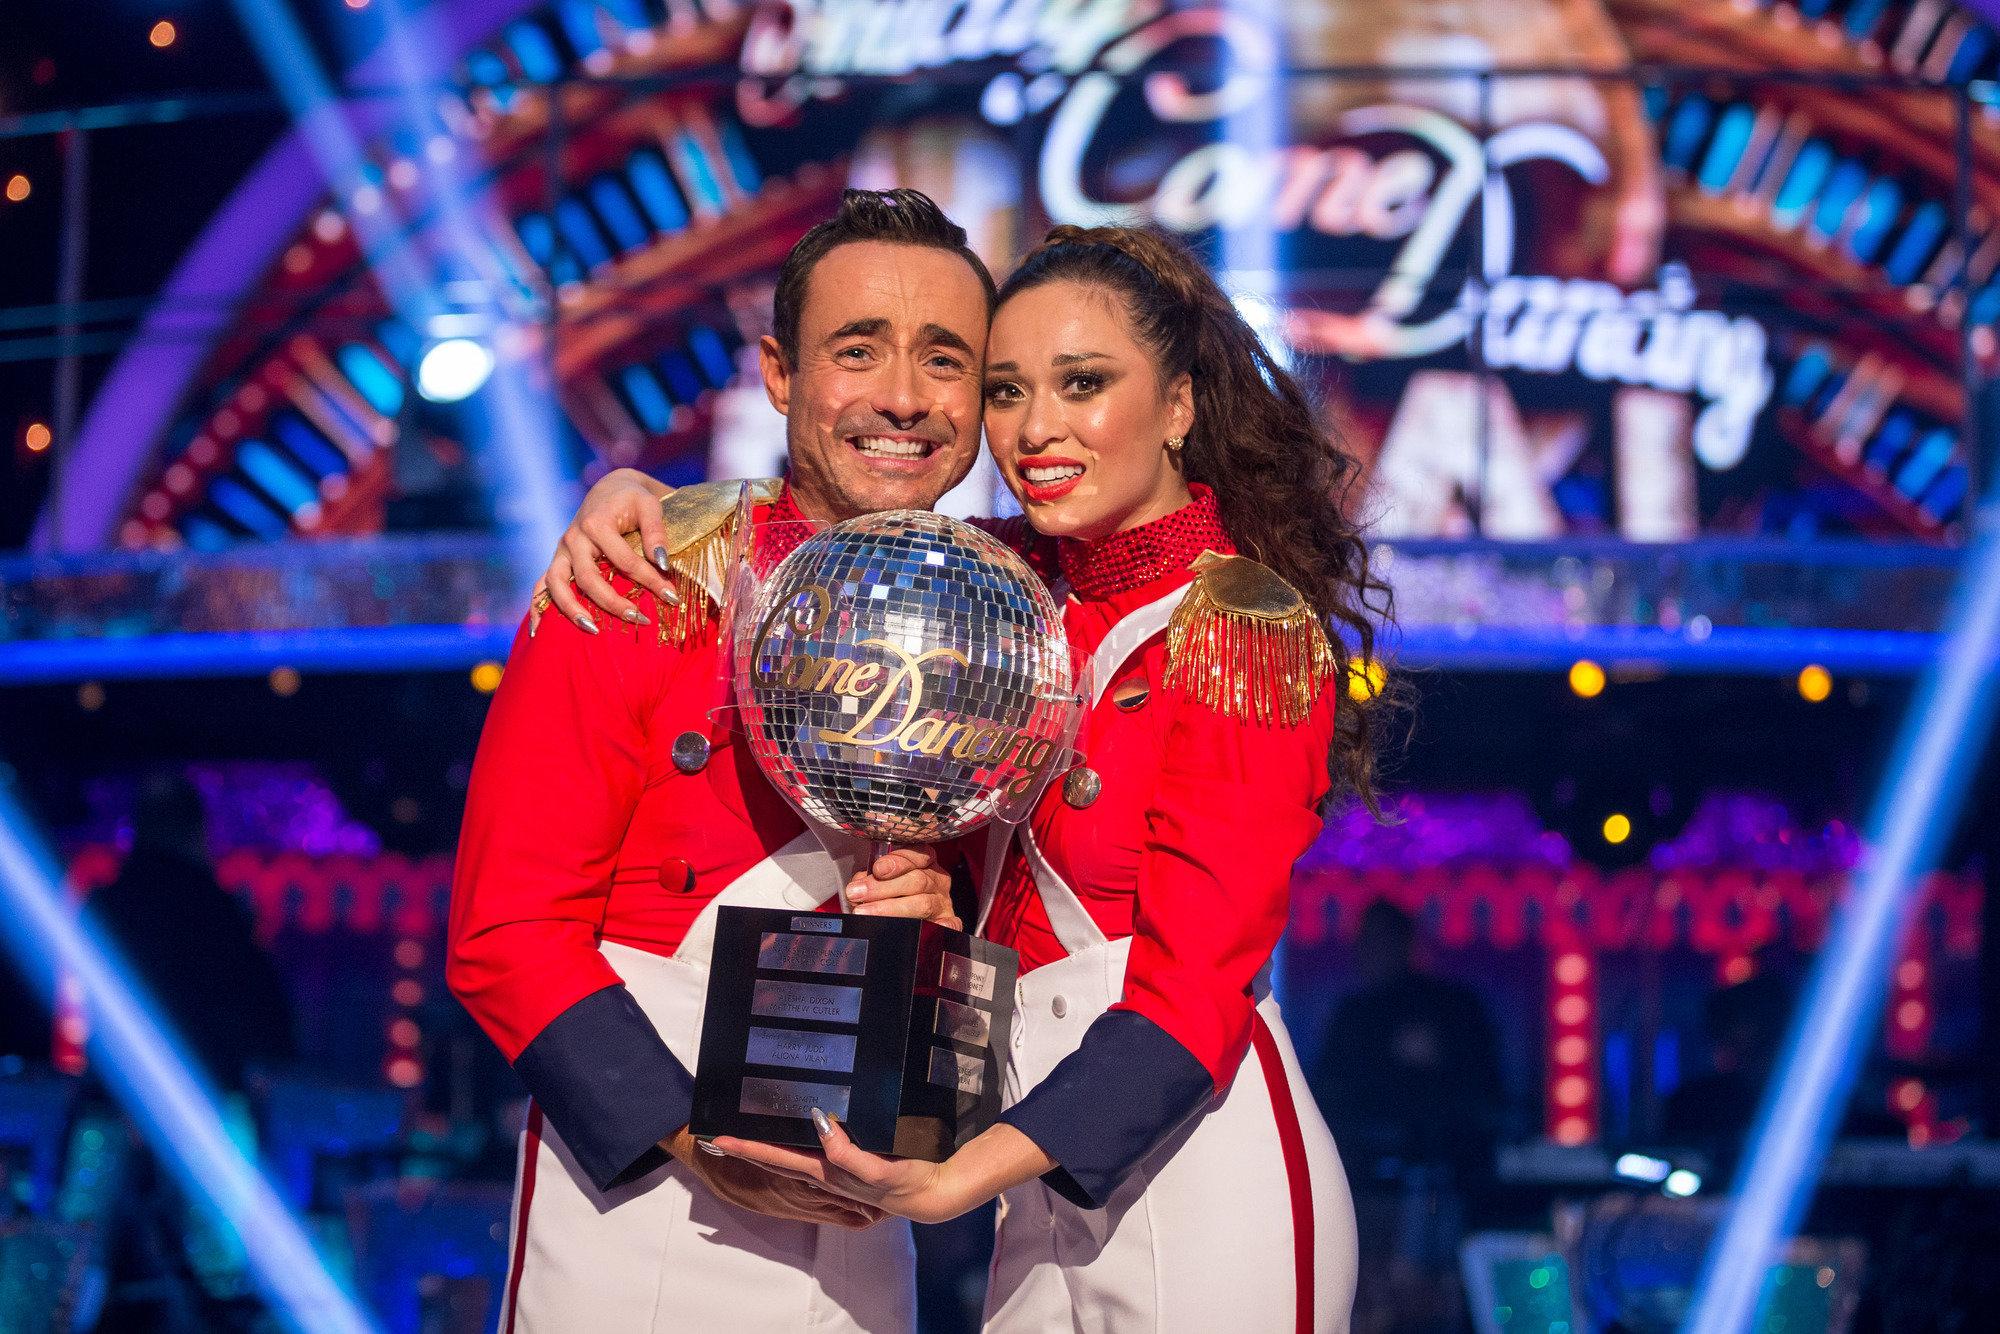 Joe with his 'Strictly' dance partner Katya